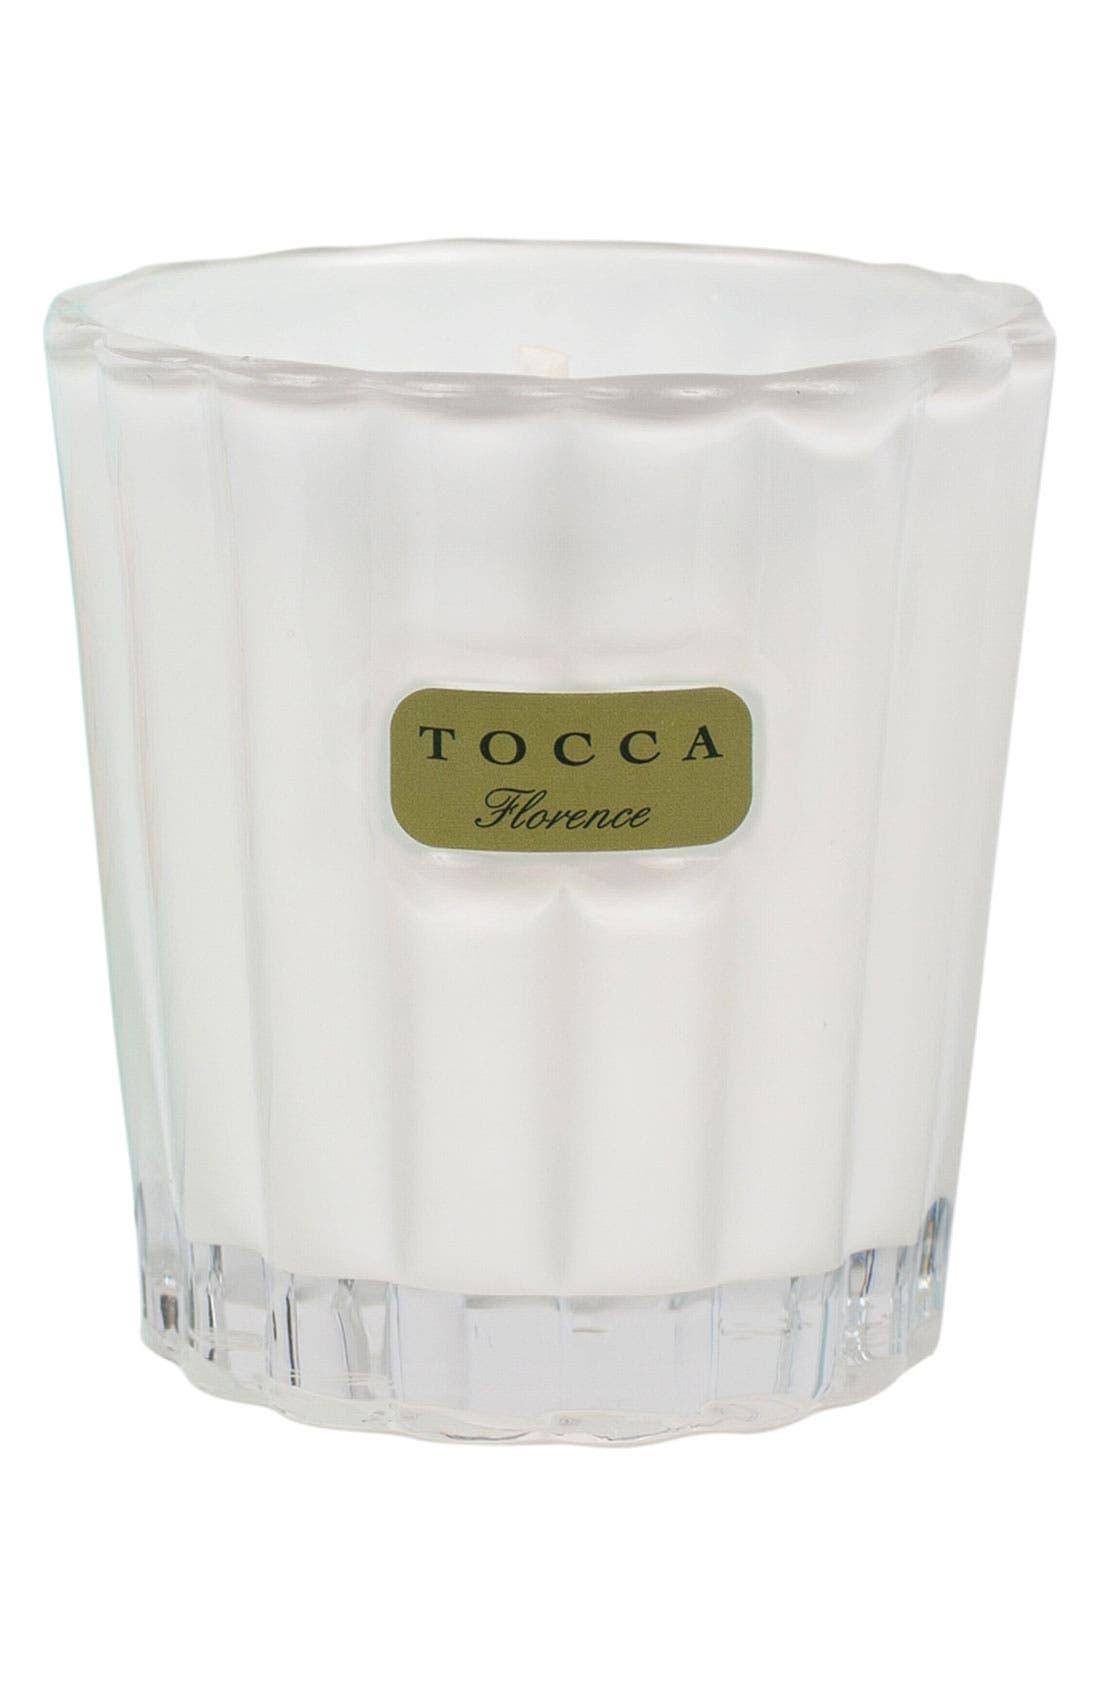 Main Image - TOCCA 'Florence' Candelina